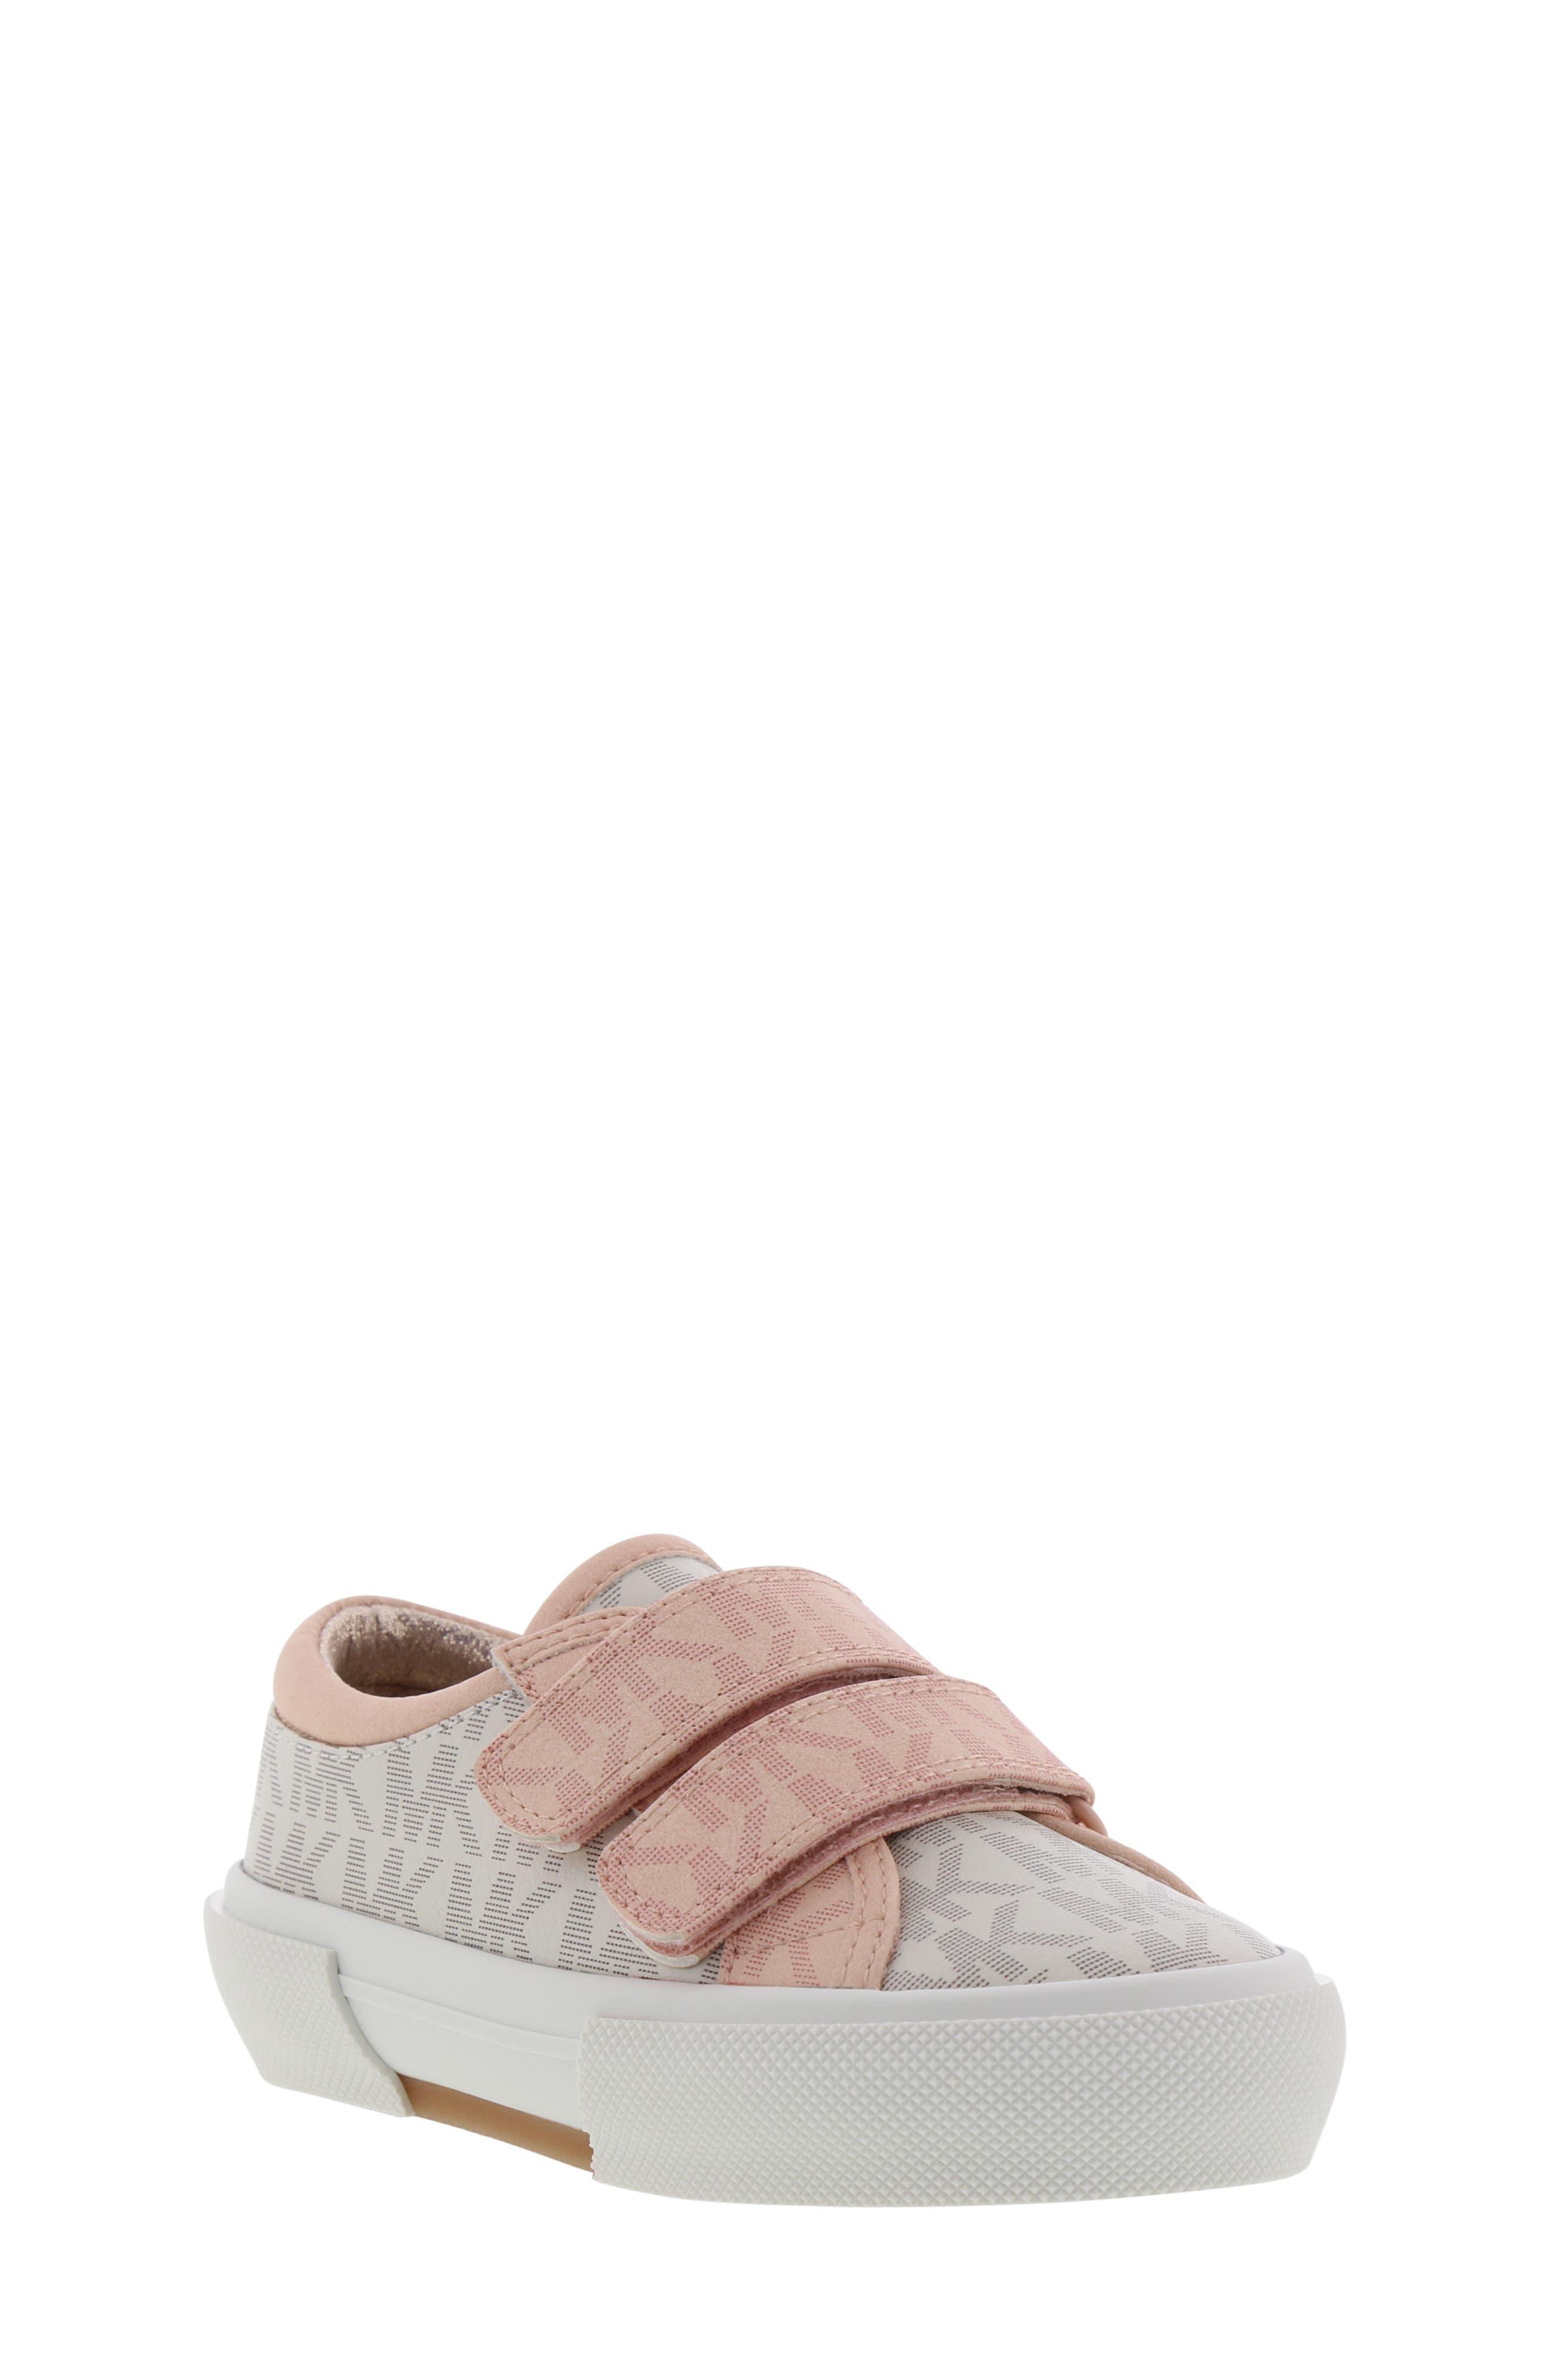 Ima Double Platform Sneaker, Main, color, VANILLA/ BLUSH